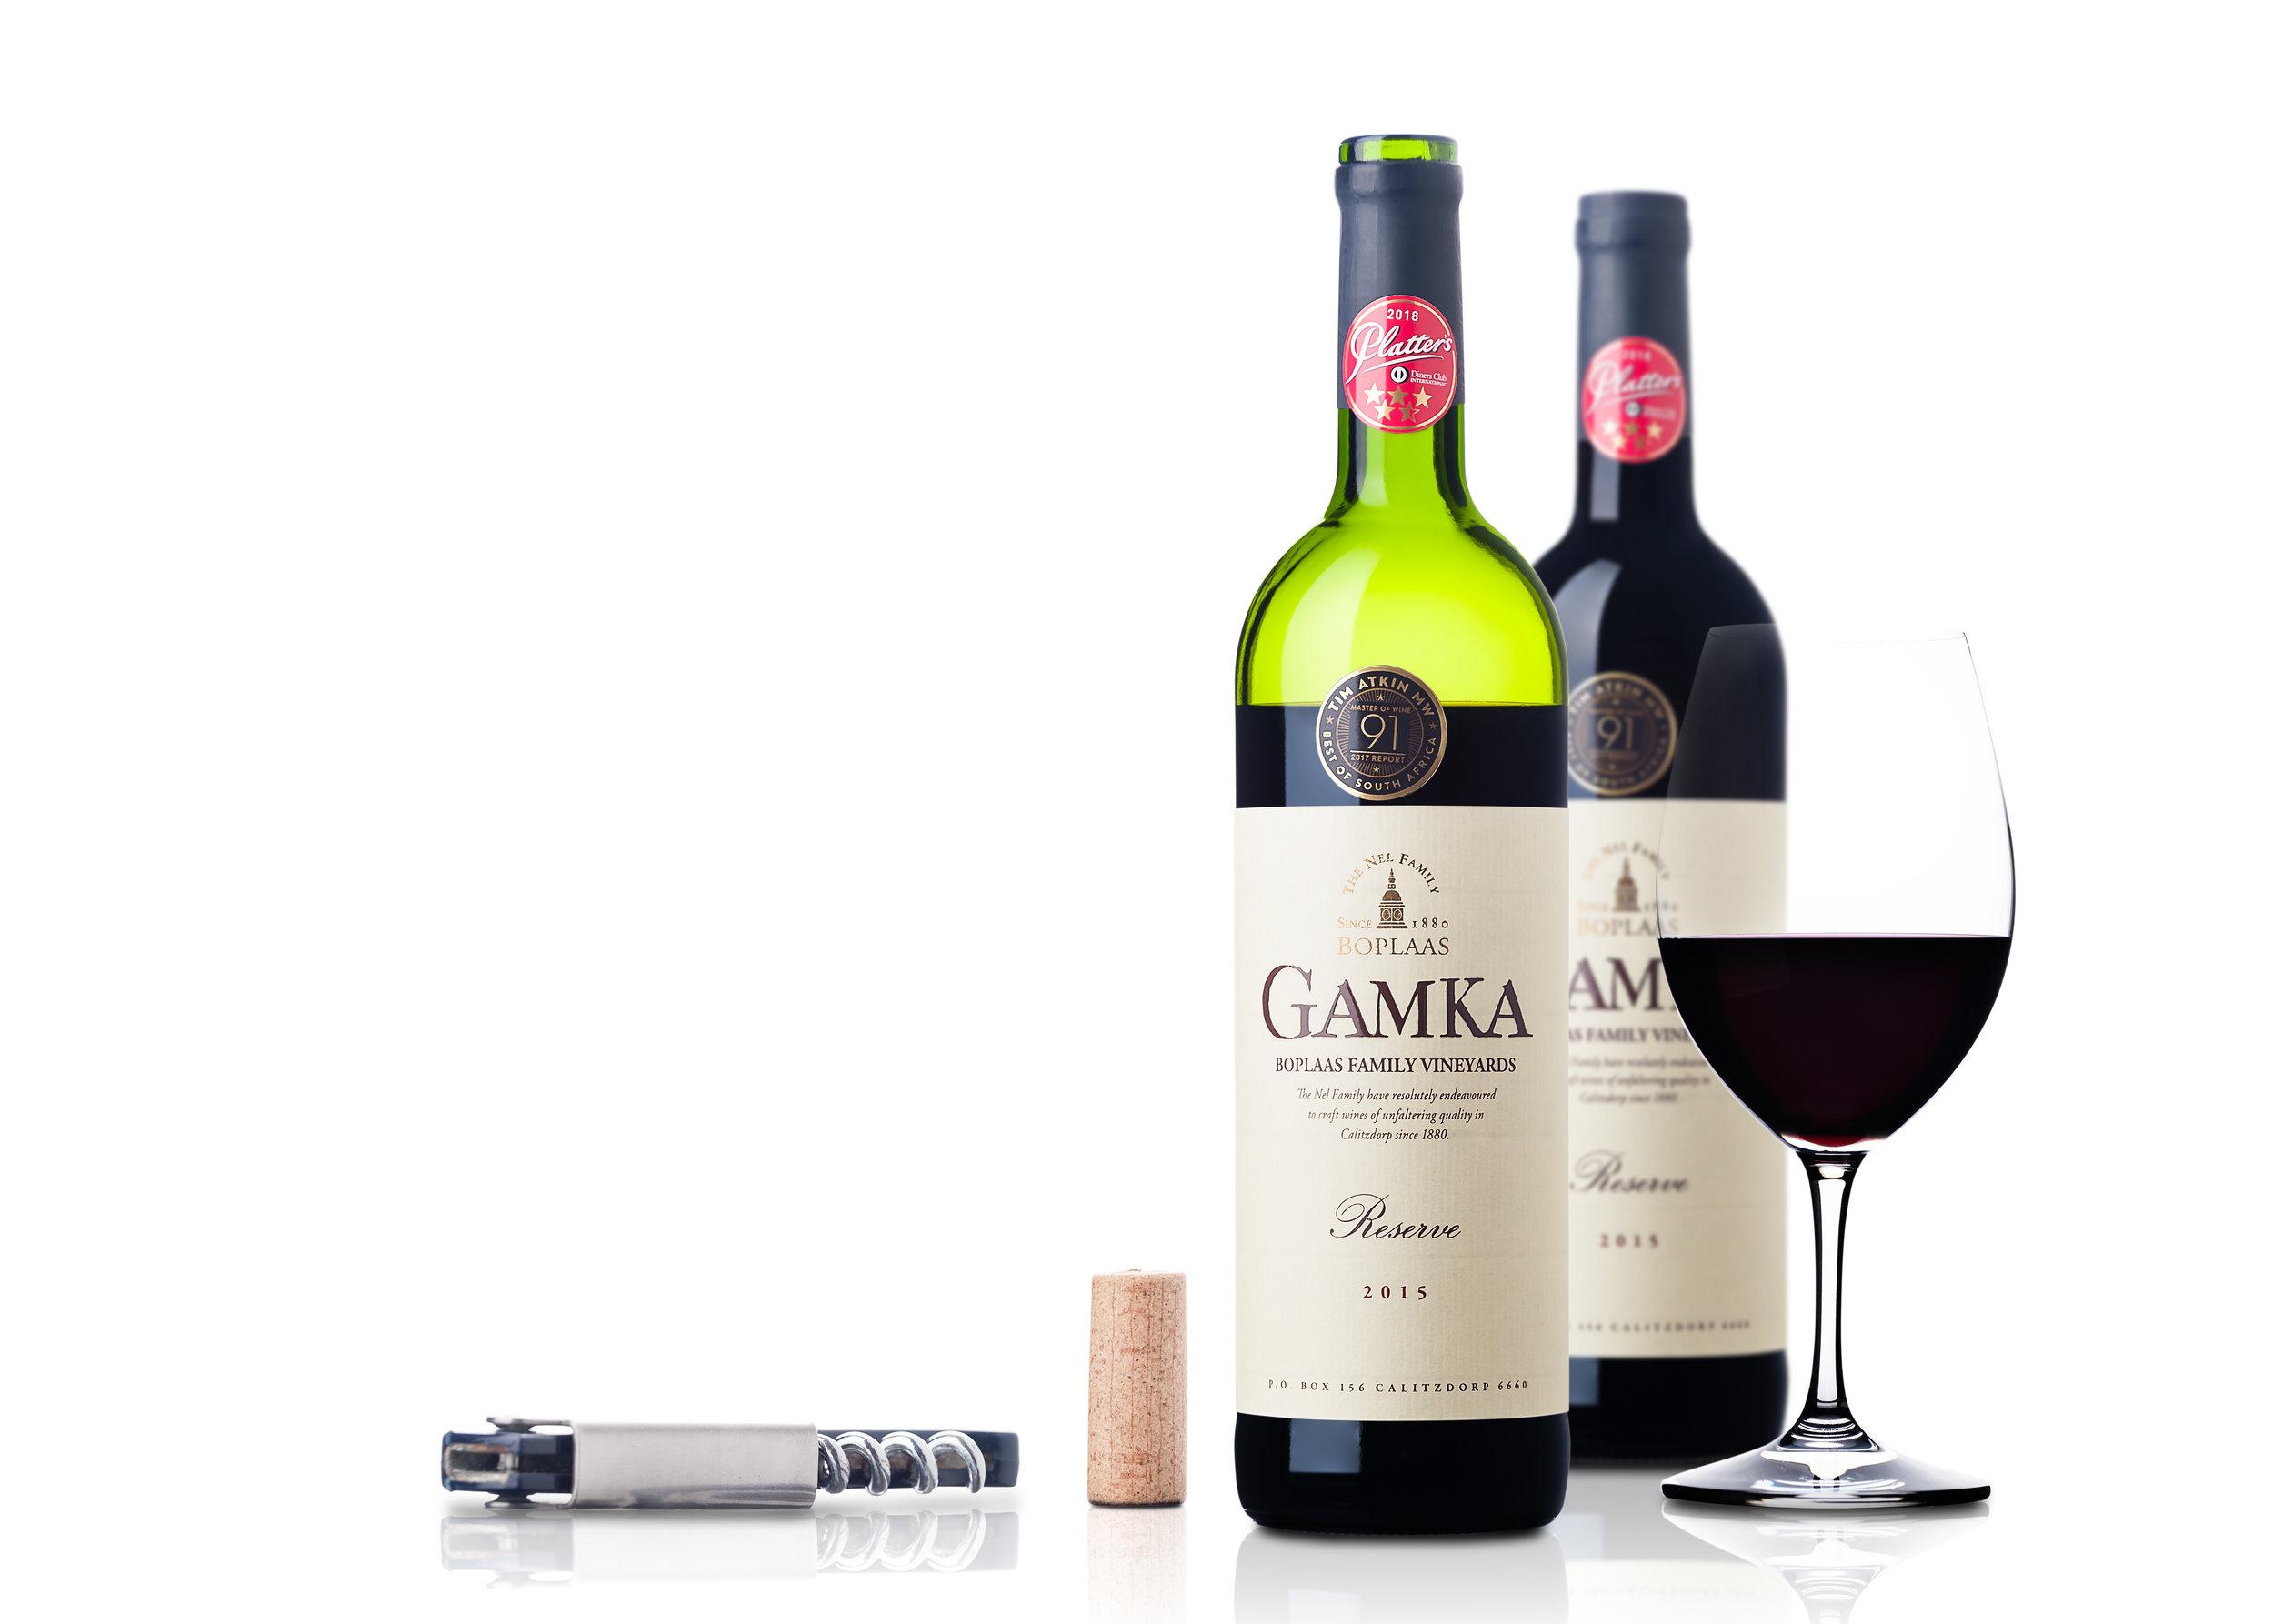 Boplaas Gamka 2015 style shot with 2 bottels and glass.jpg